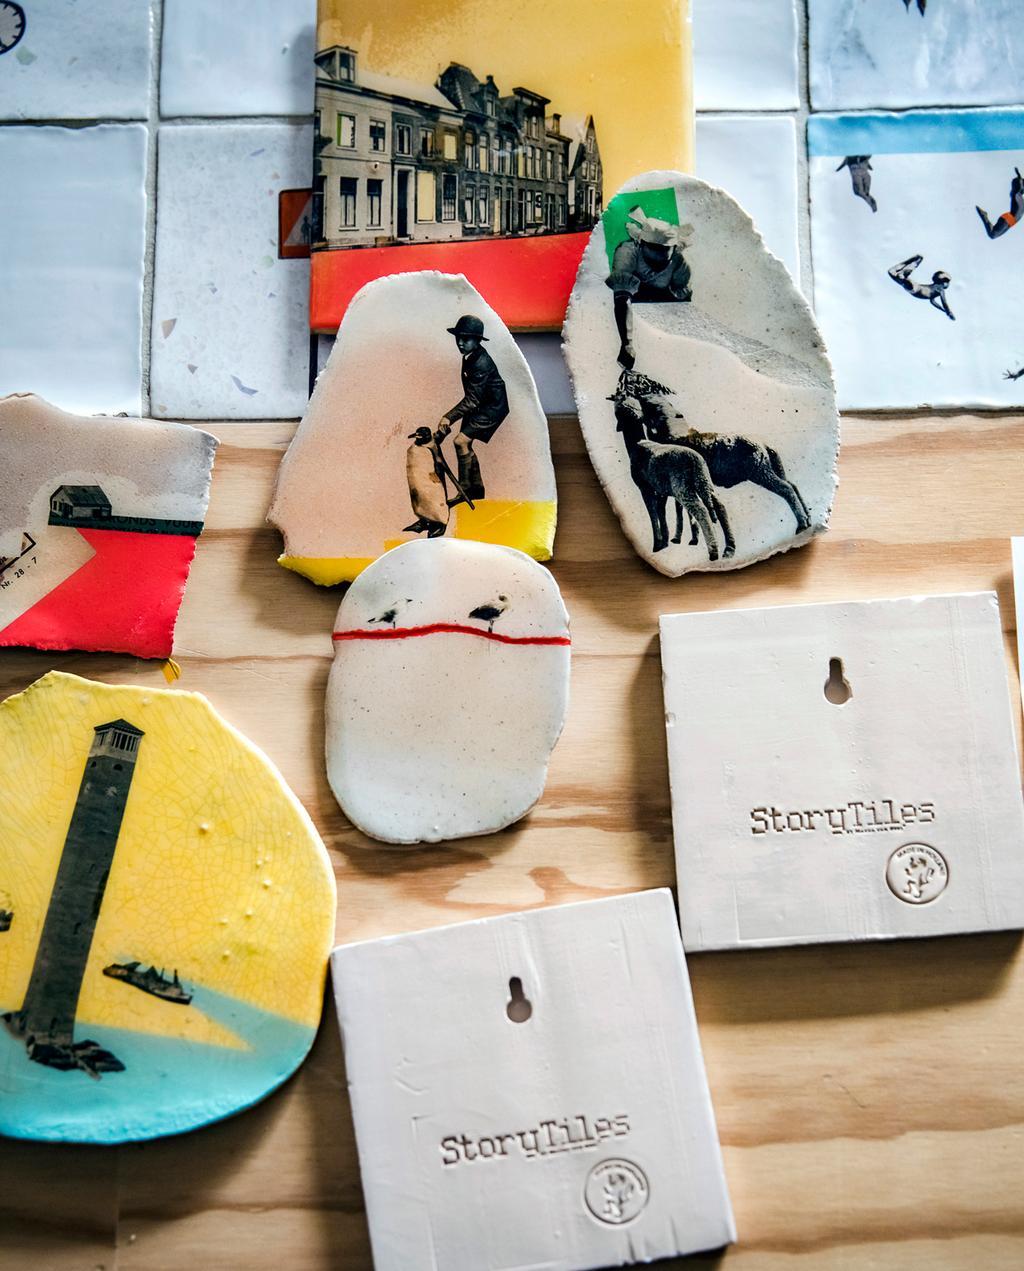 vtwonen 04-2020 | kunstwerkjes op tegels | StoryTiles